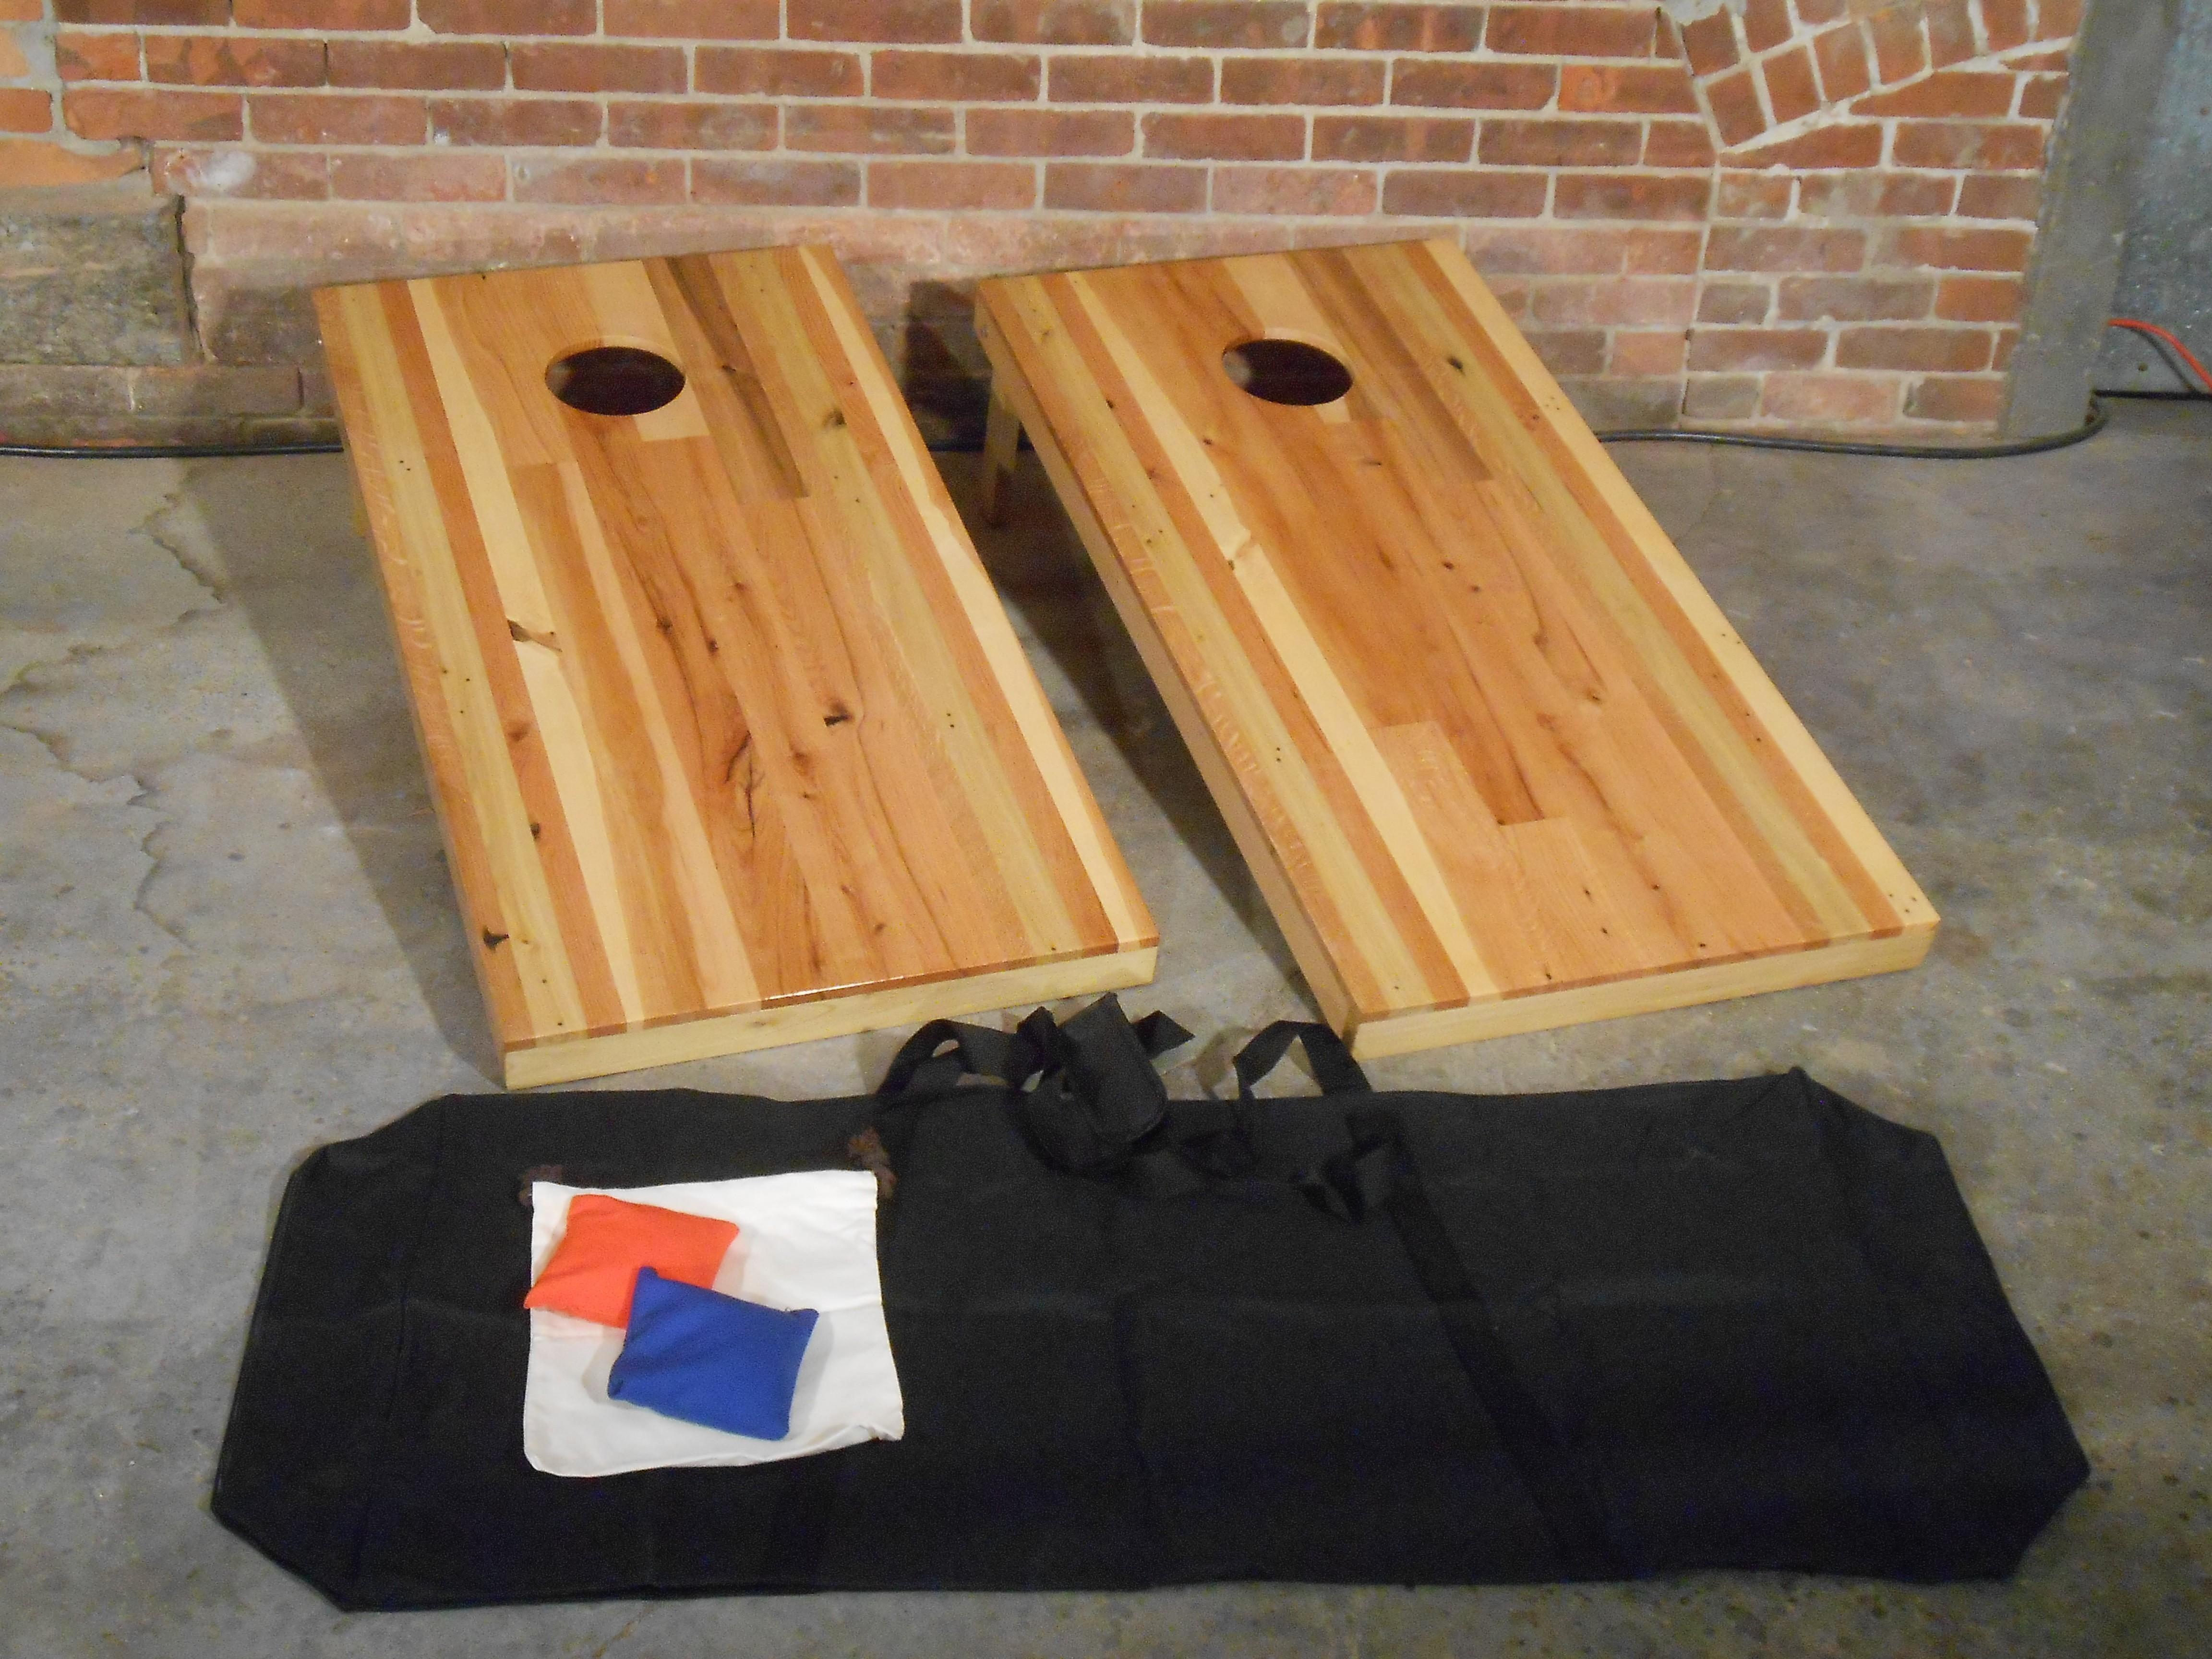 Cornhole beanbag toss hardwood pallet wood deluxe II